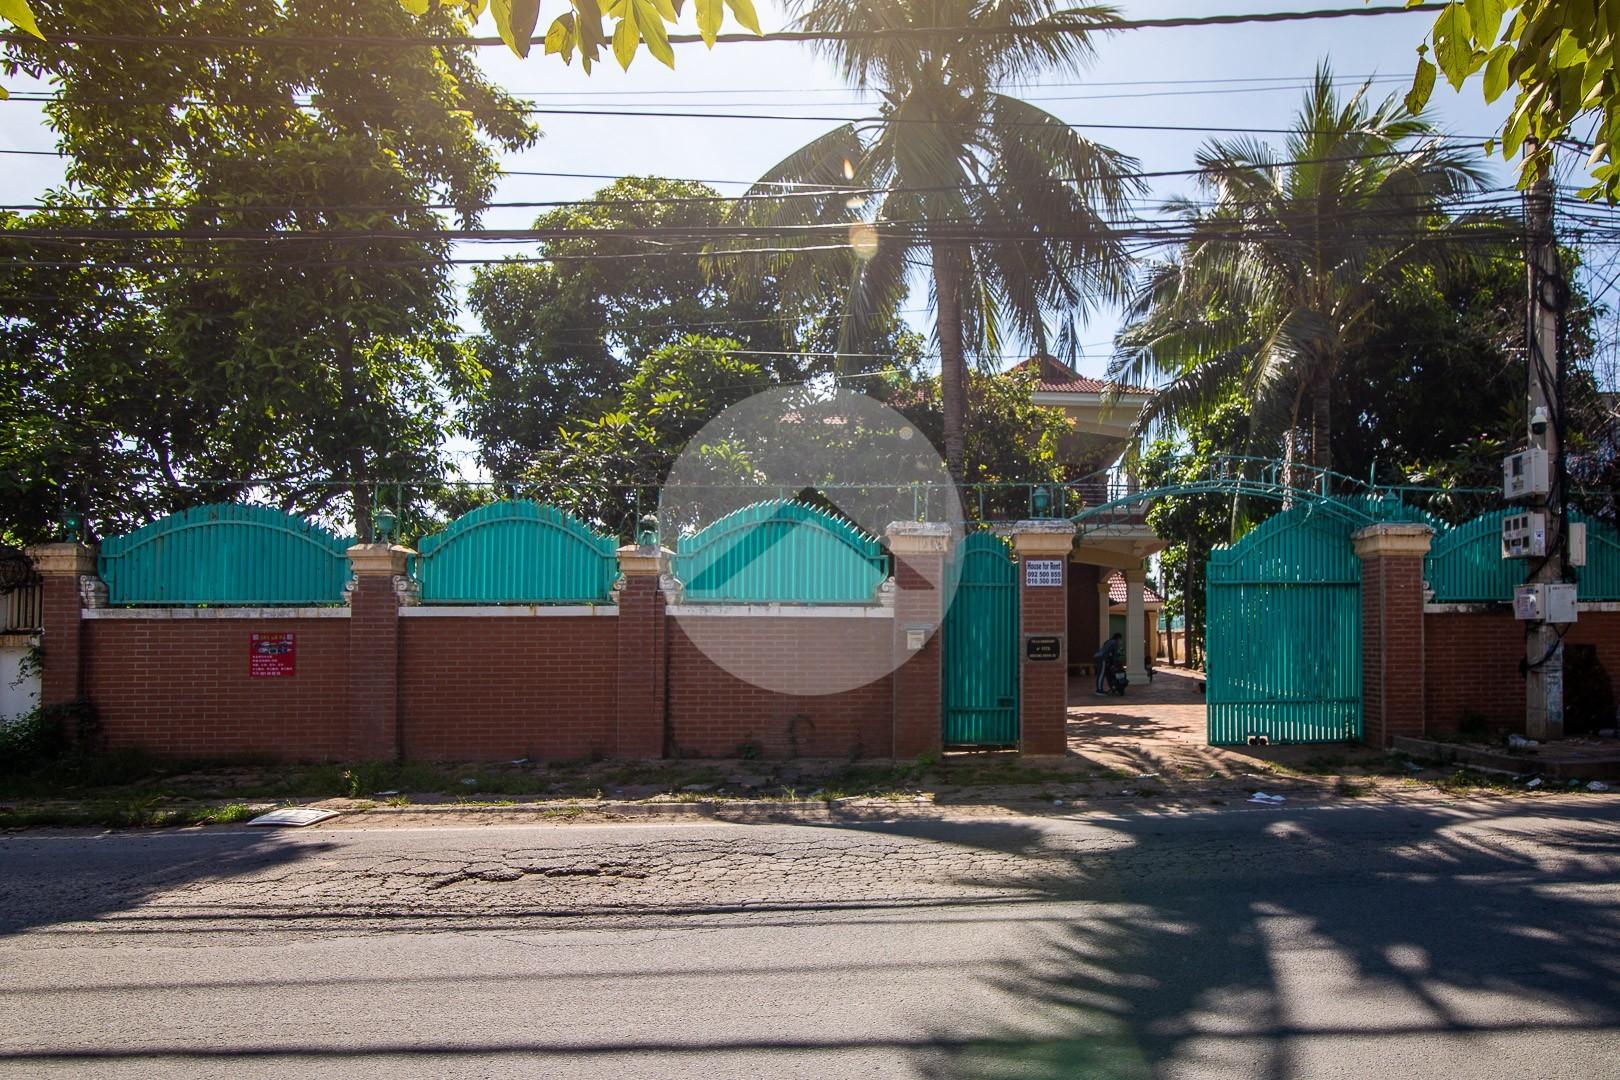 4 Bedroom Villa For Rent - Chroy Changvar, Phnom Penh